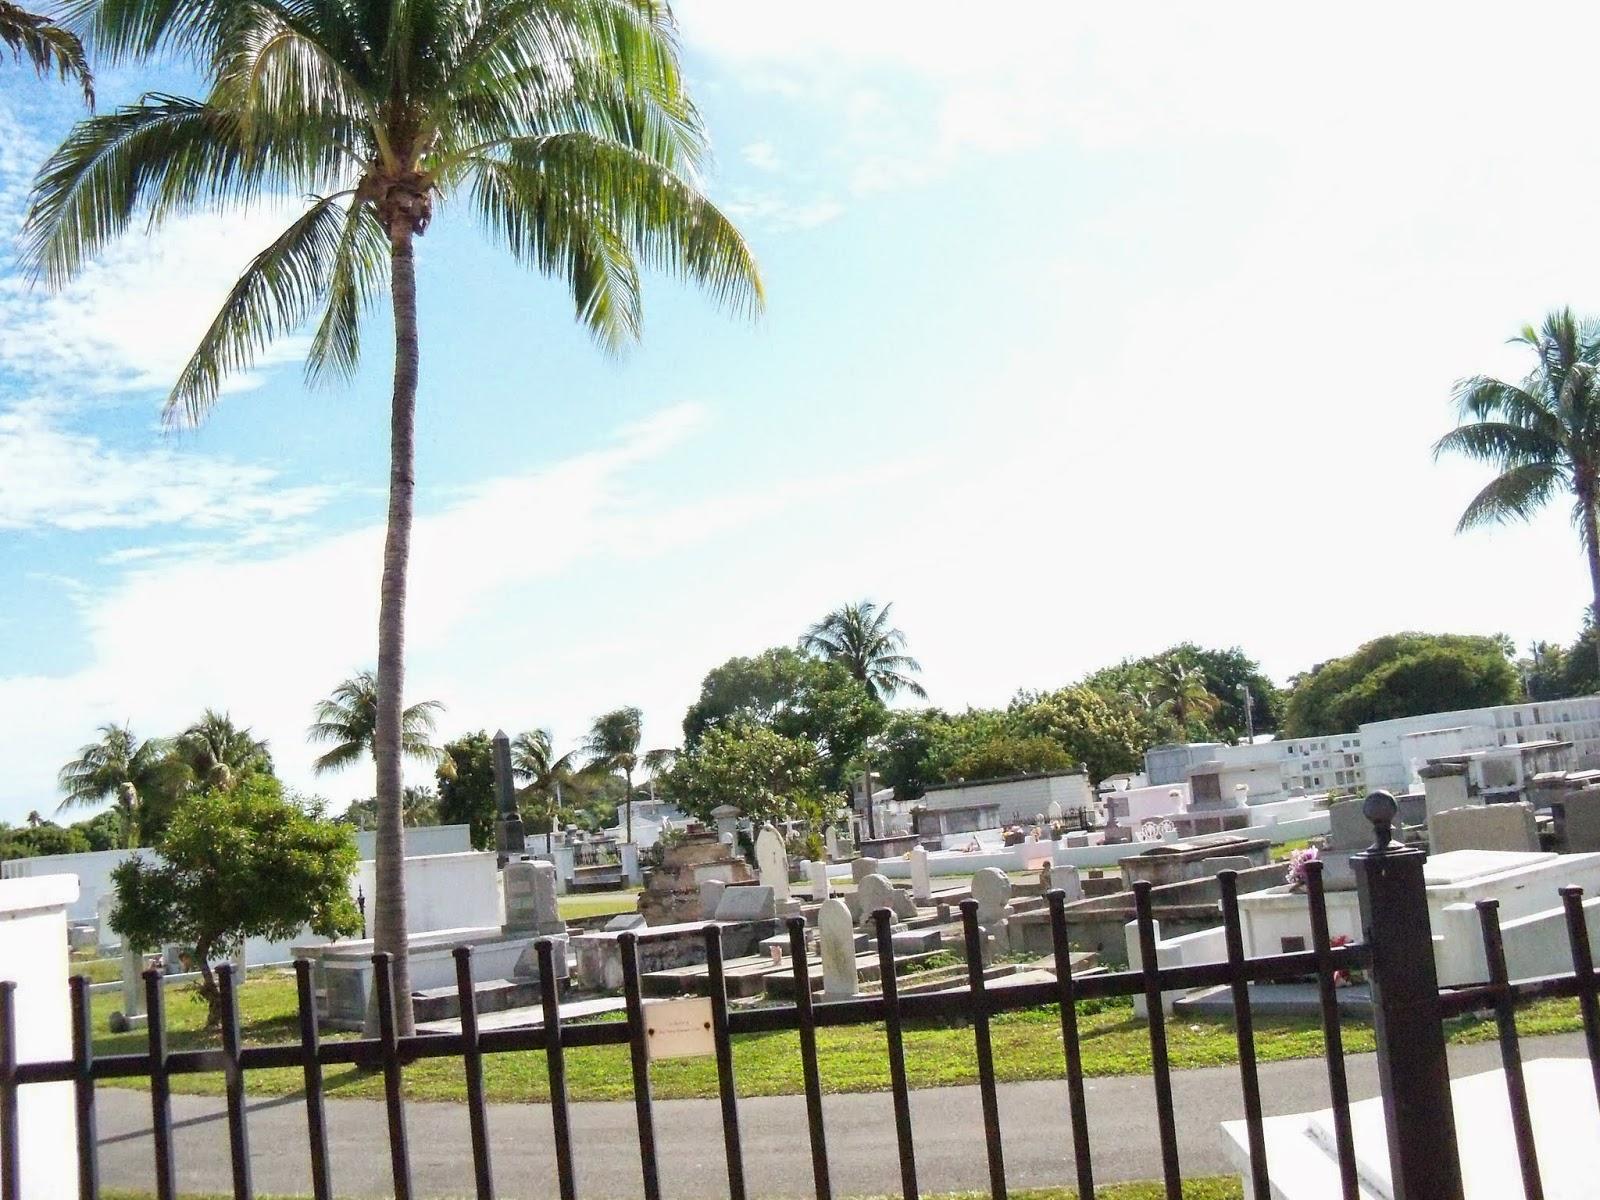 Key West Vacation - 116_5656.JPG